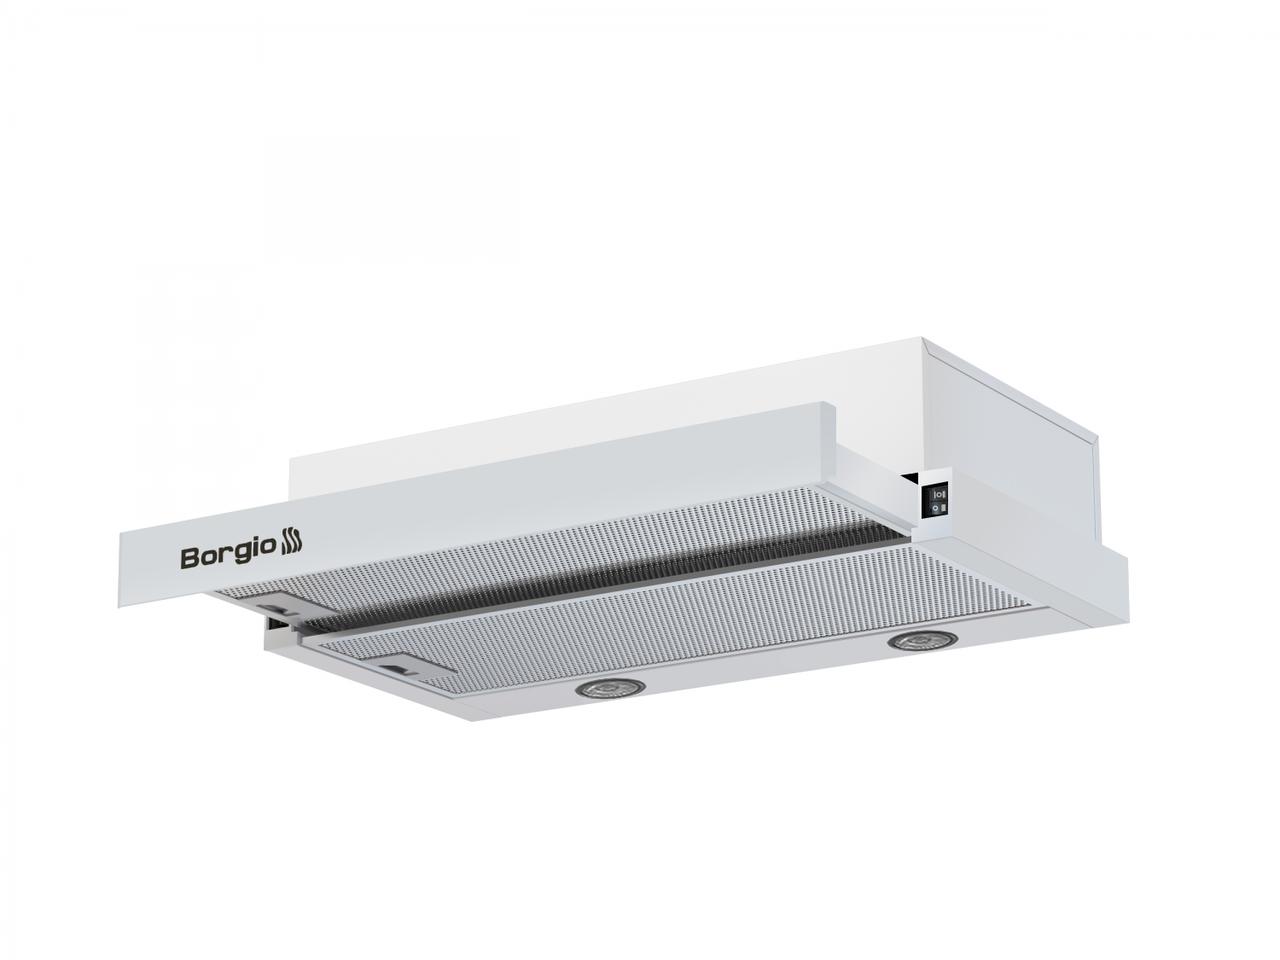 Кухонная вытяжка Borgio BLT (R) 600 мм